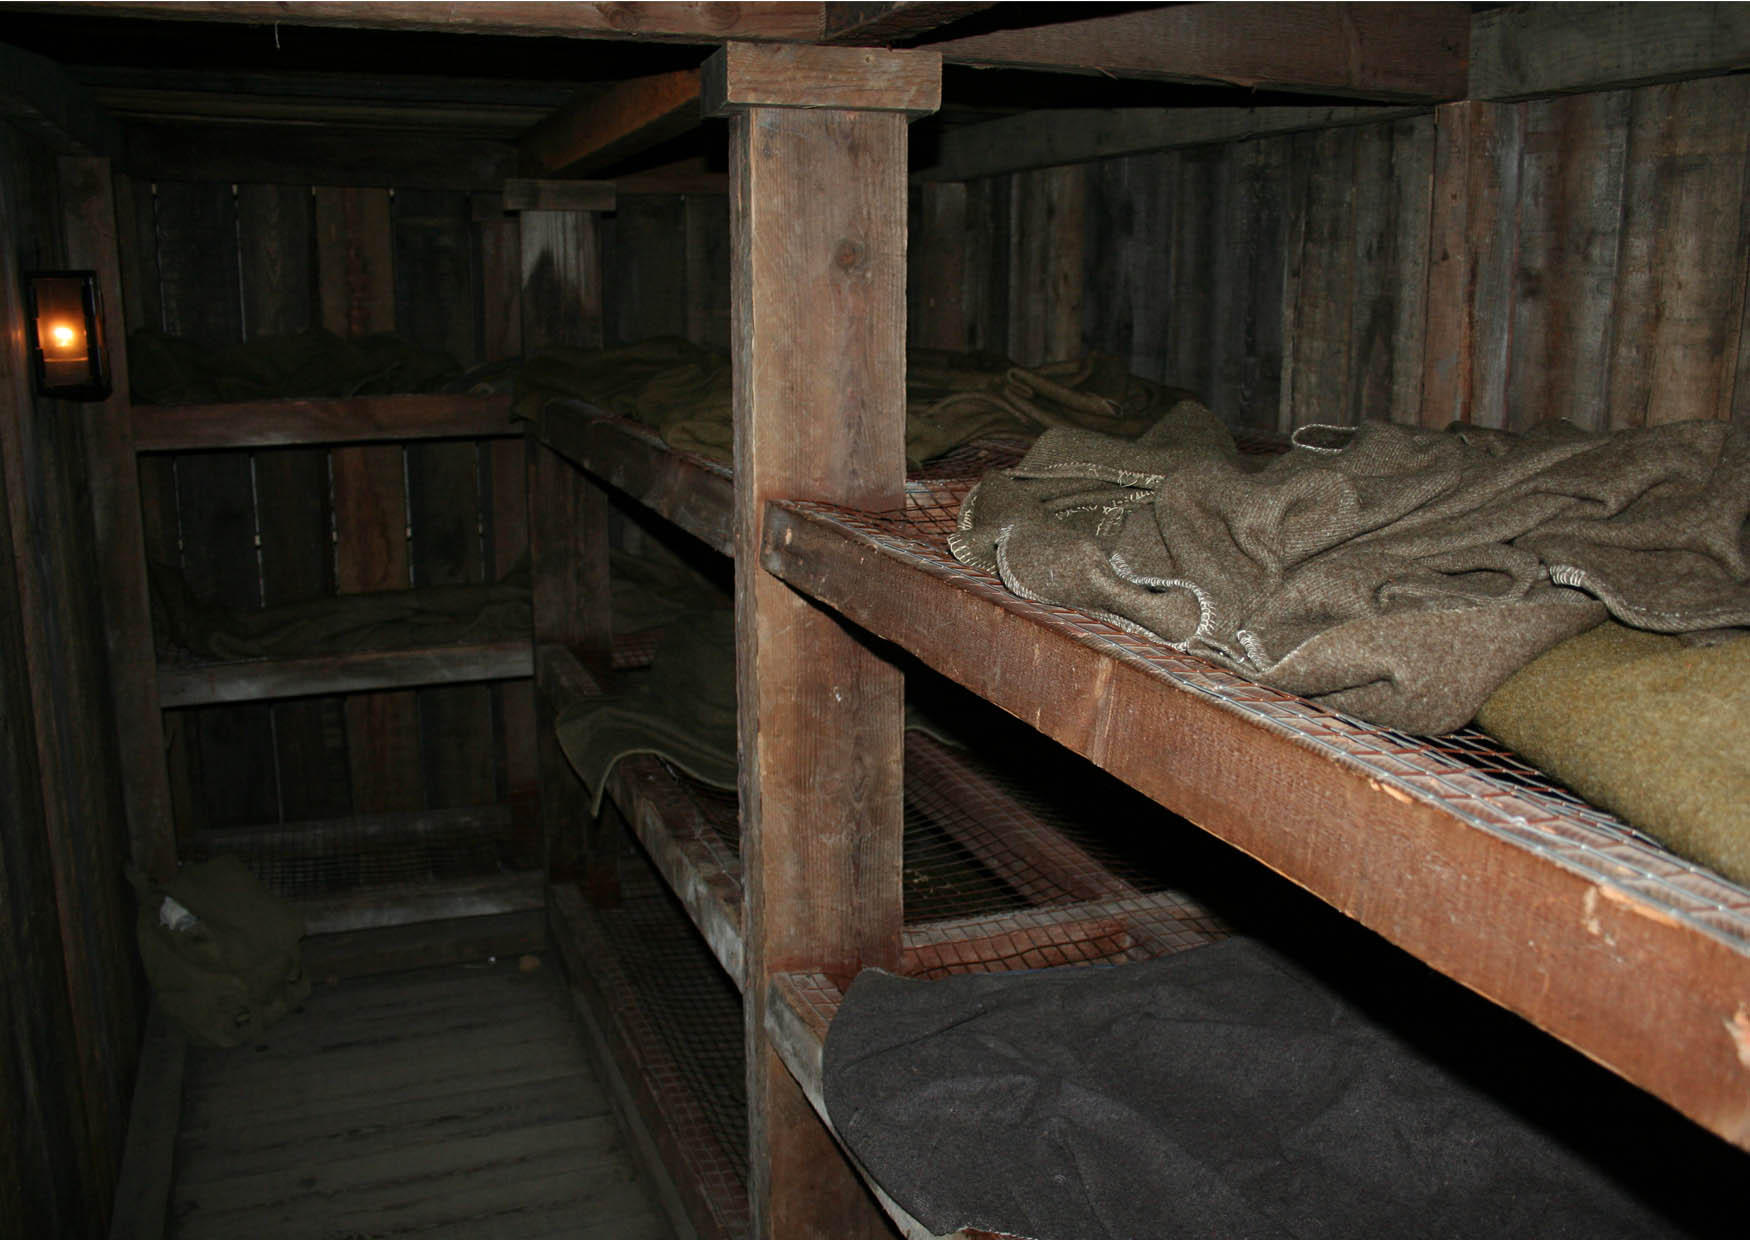 Fotografia dormitori all 39 interno dei rifugi sotterranei imm 12722 - Terras schuilplaats ...